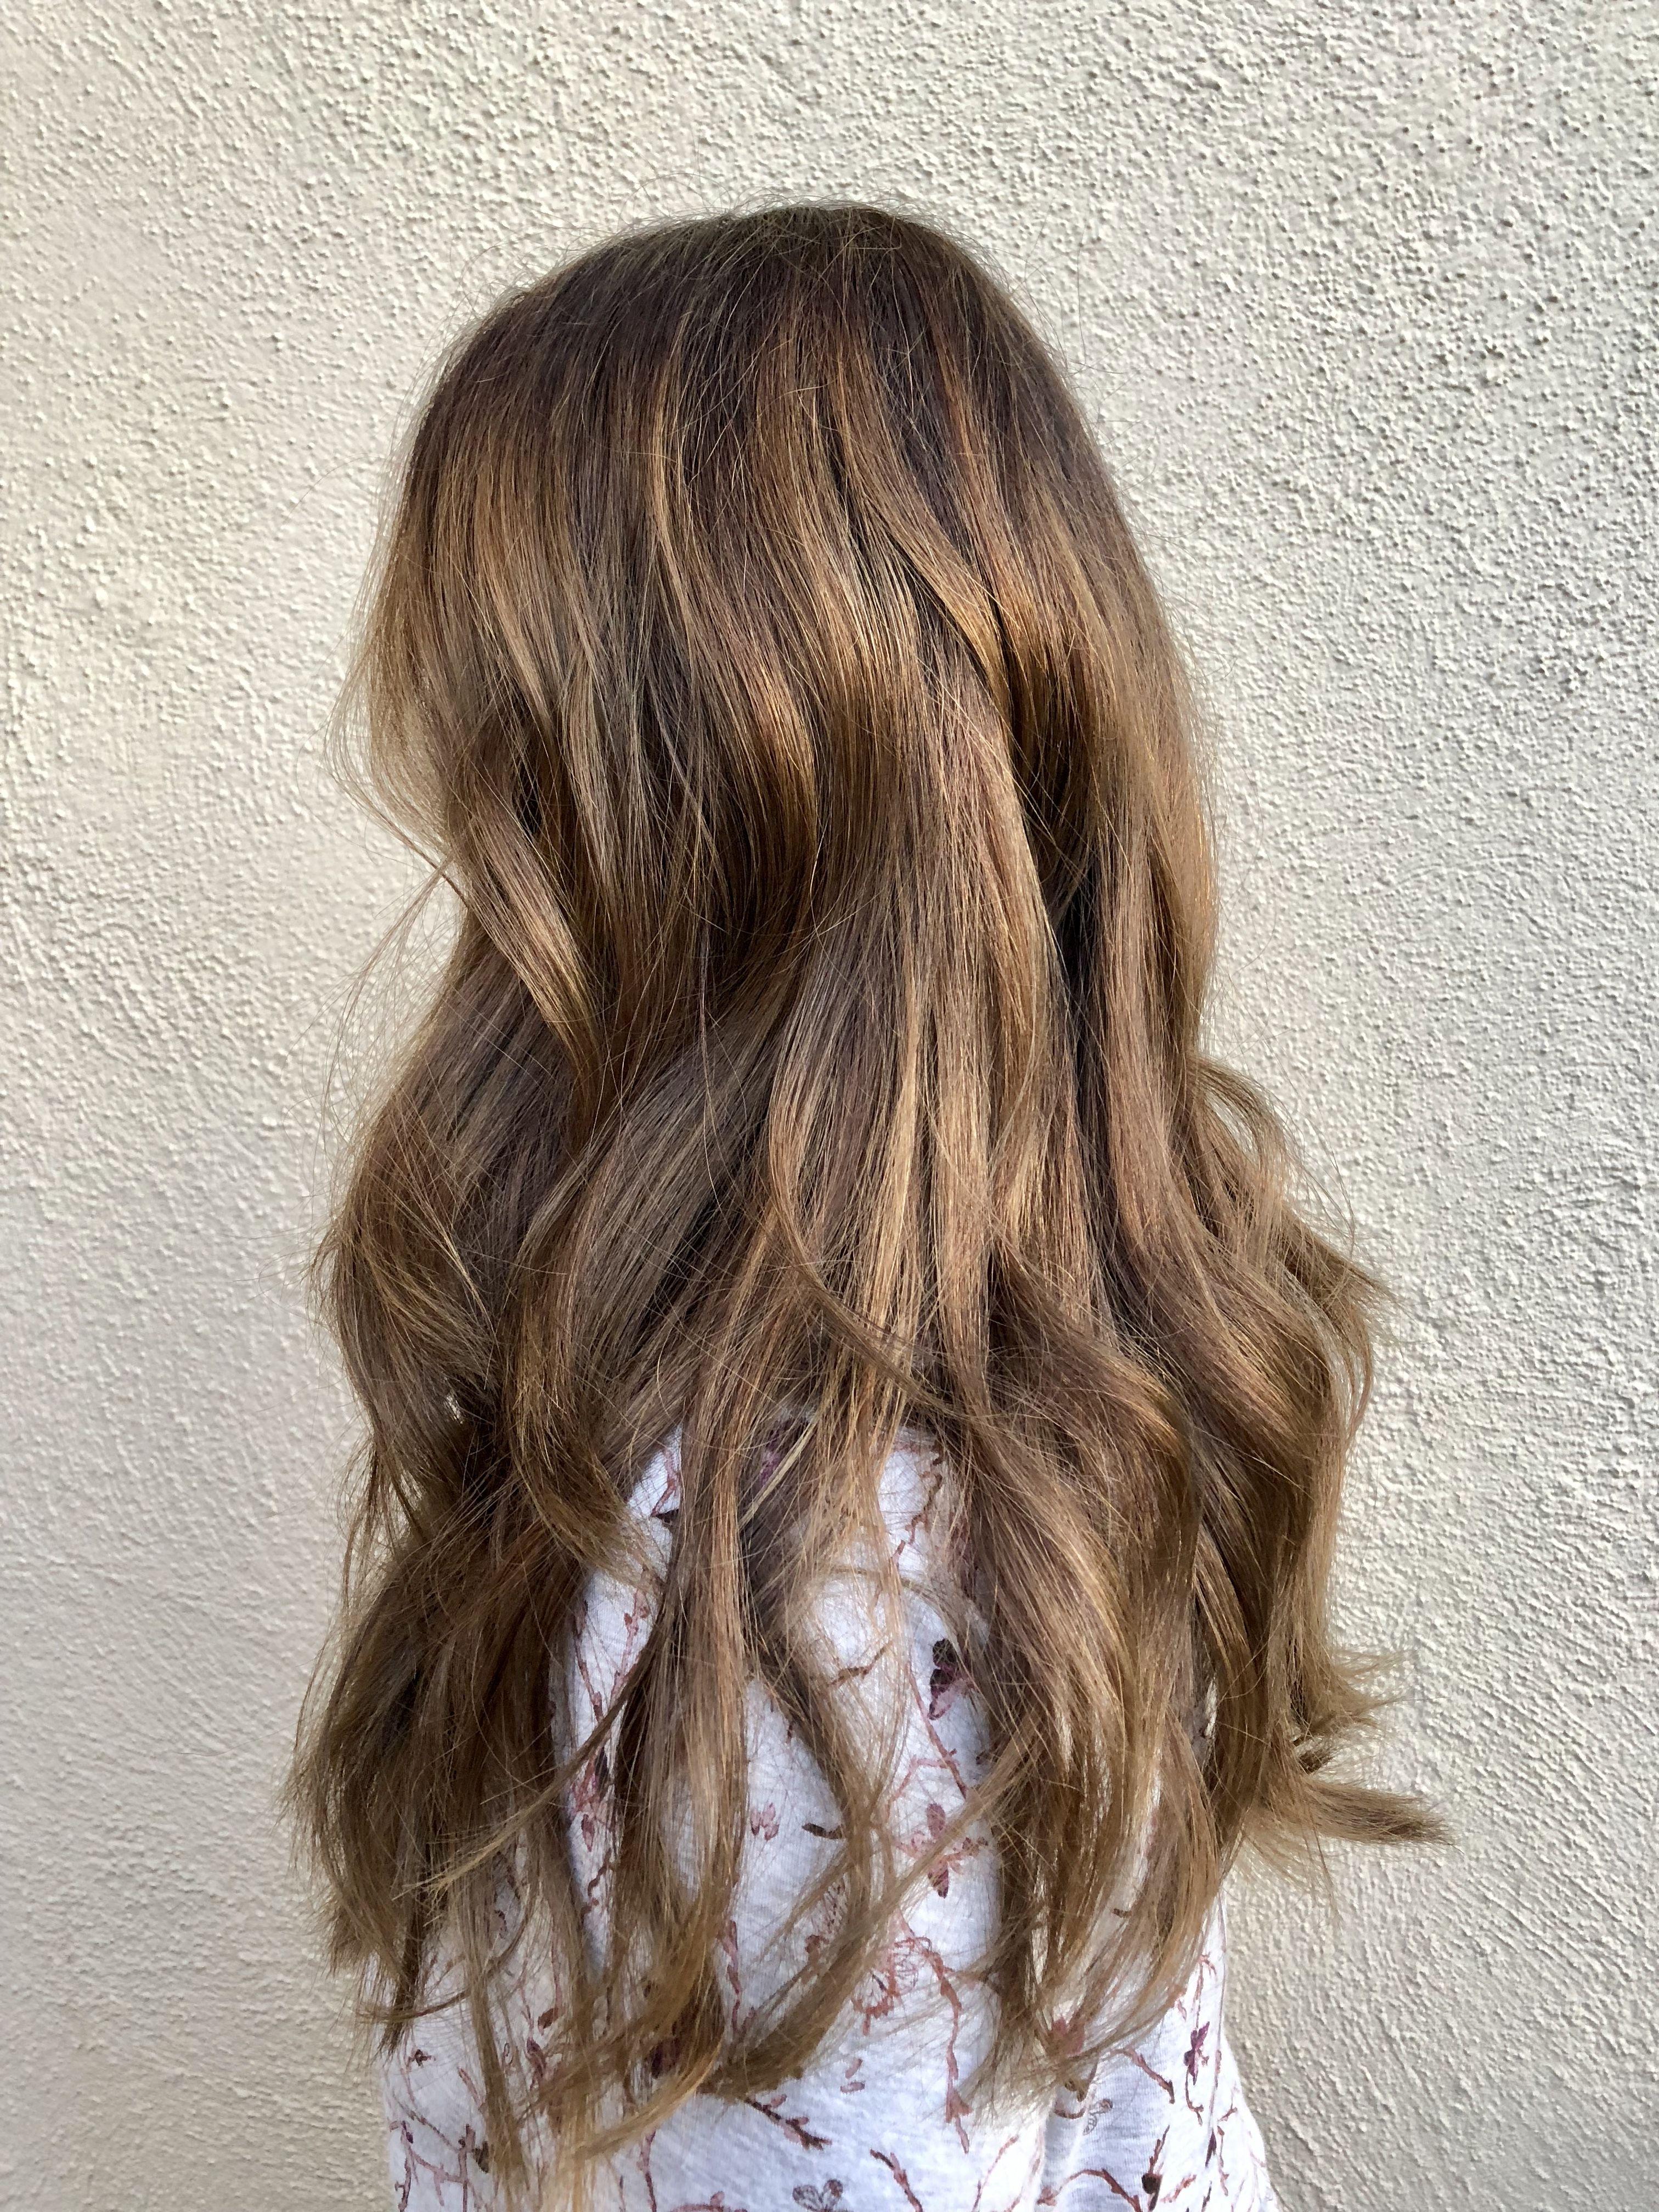 Balayage hair hairbyorit haircolor pravana color sunkissedhair